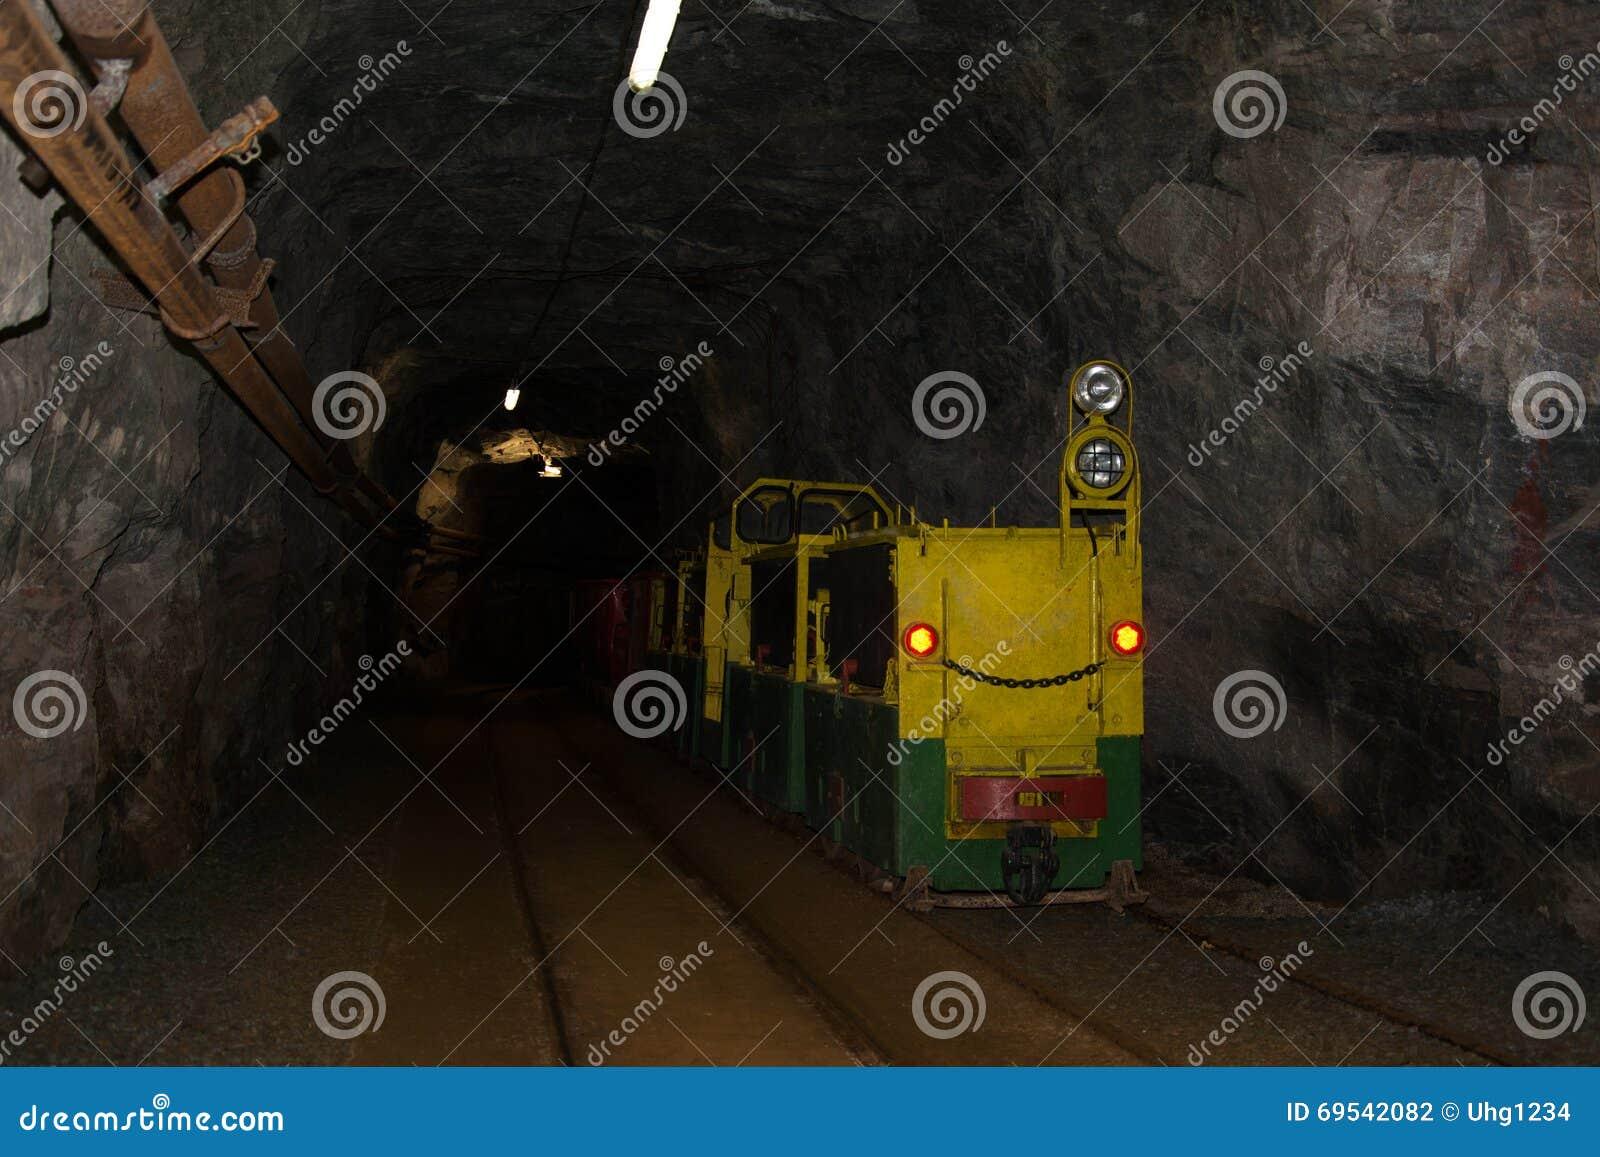 German below ground